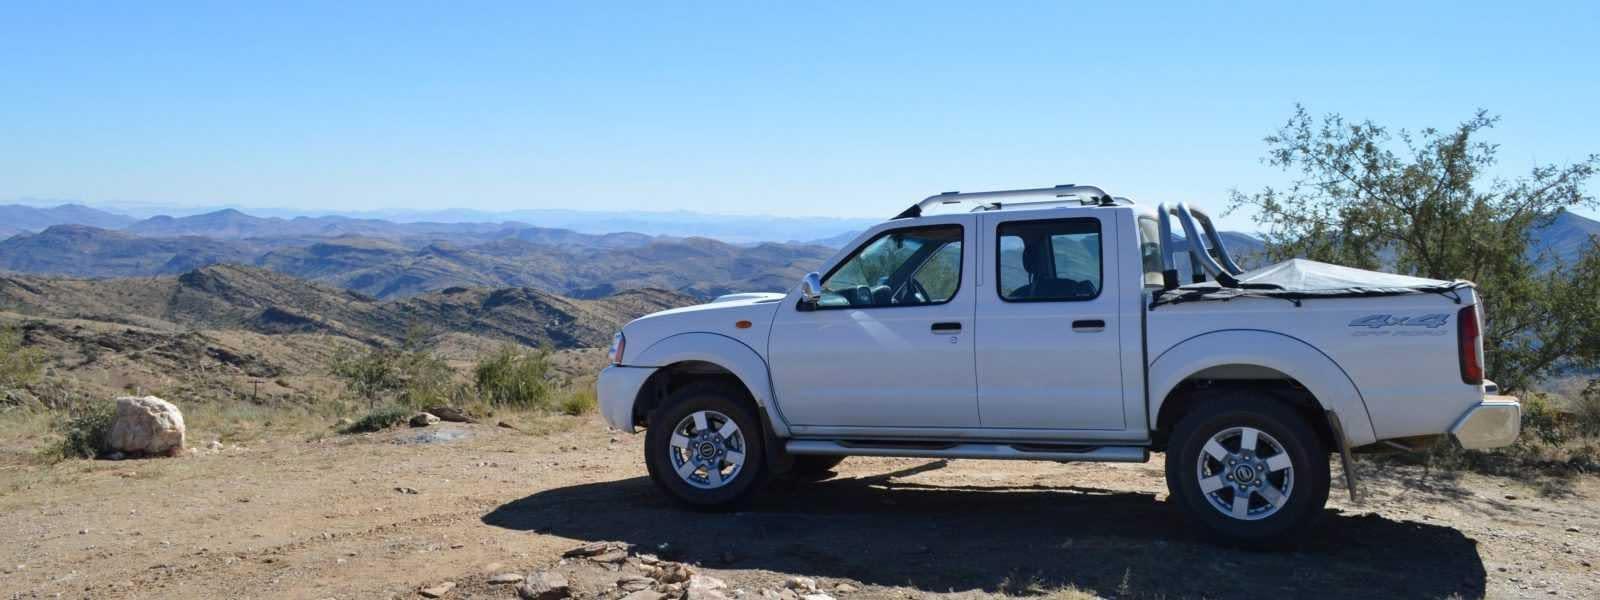 Gamsberg Pass Namibia Adventure